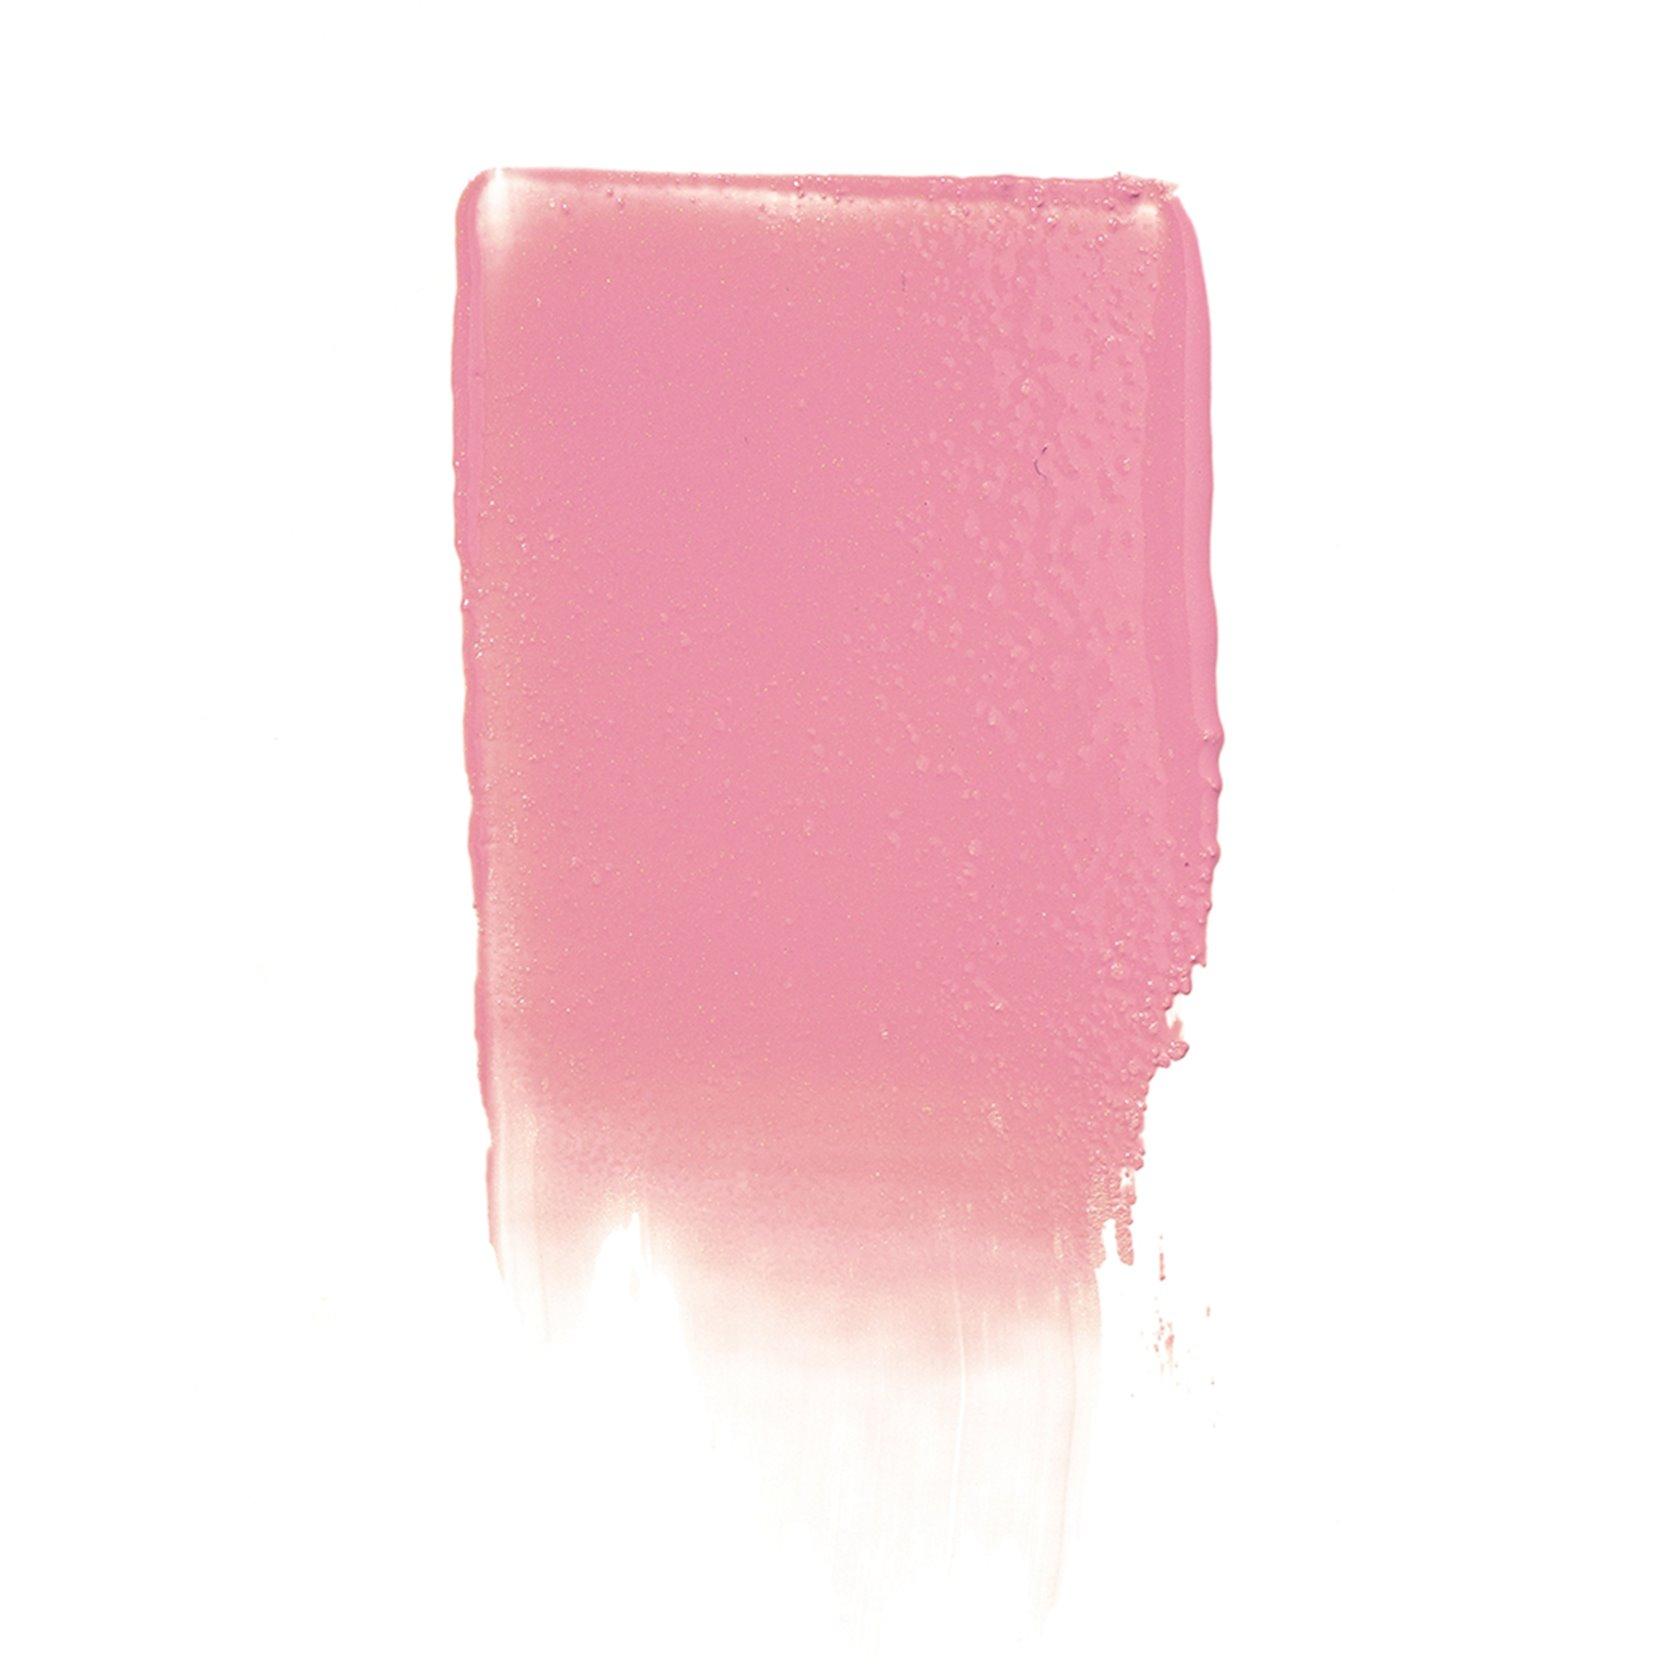 Pomada-balzam Vivienne Sabo Baume A Levres Color Lip Balm çalar 03 4 qr